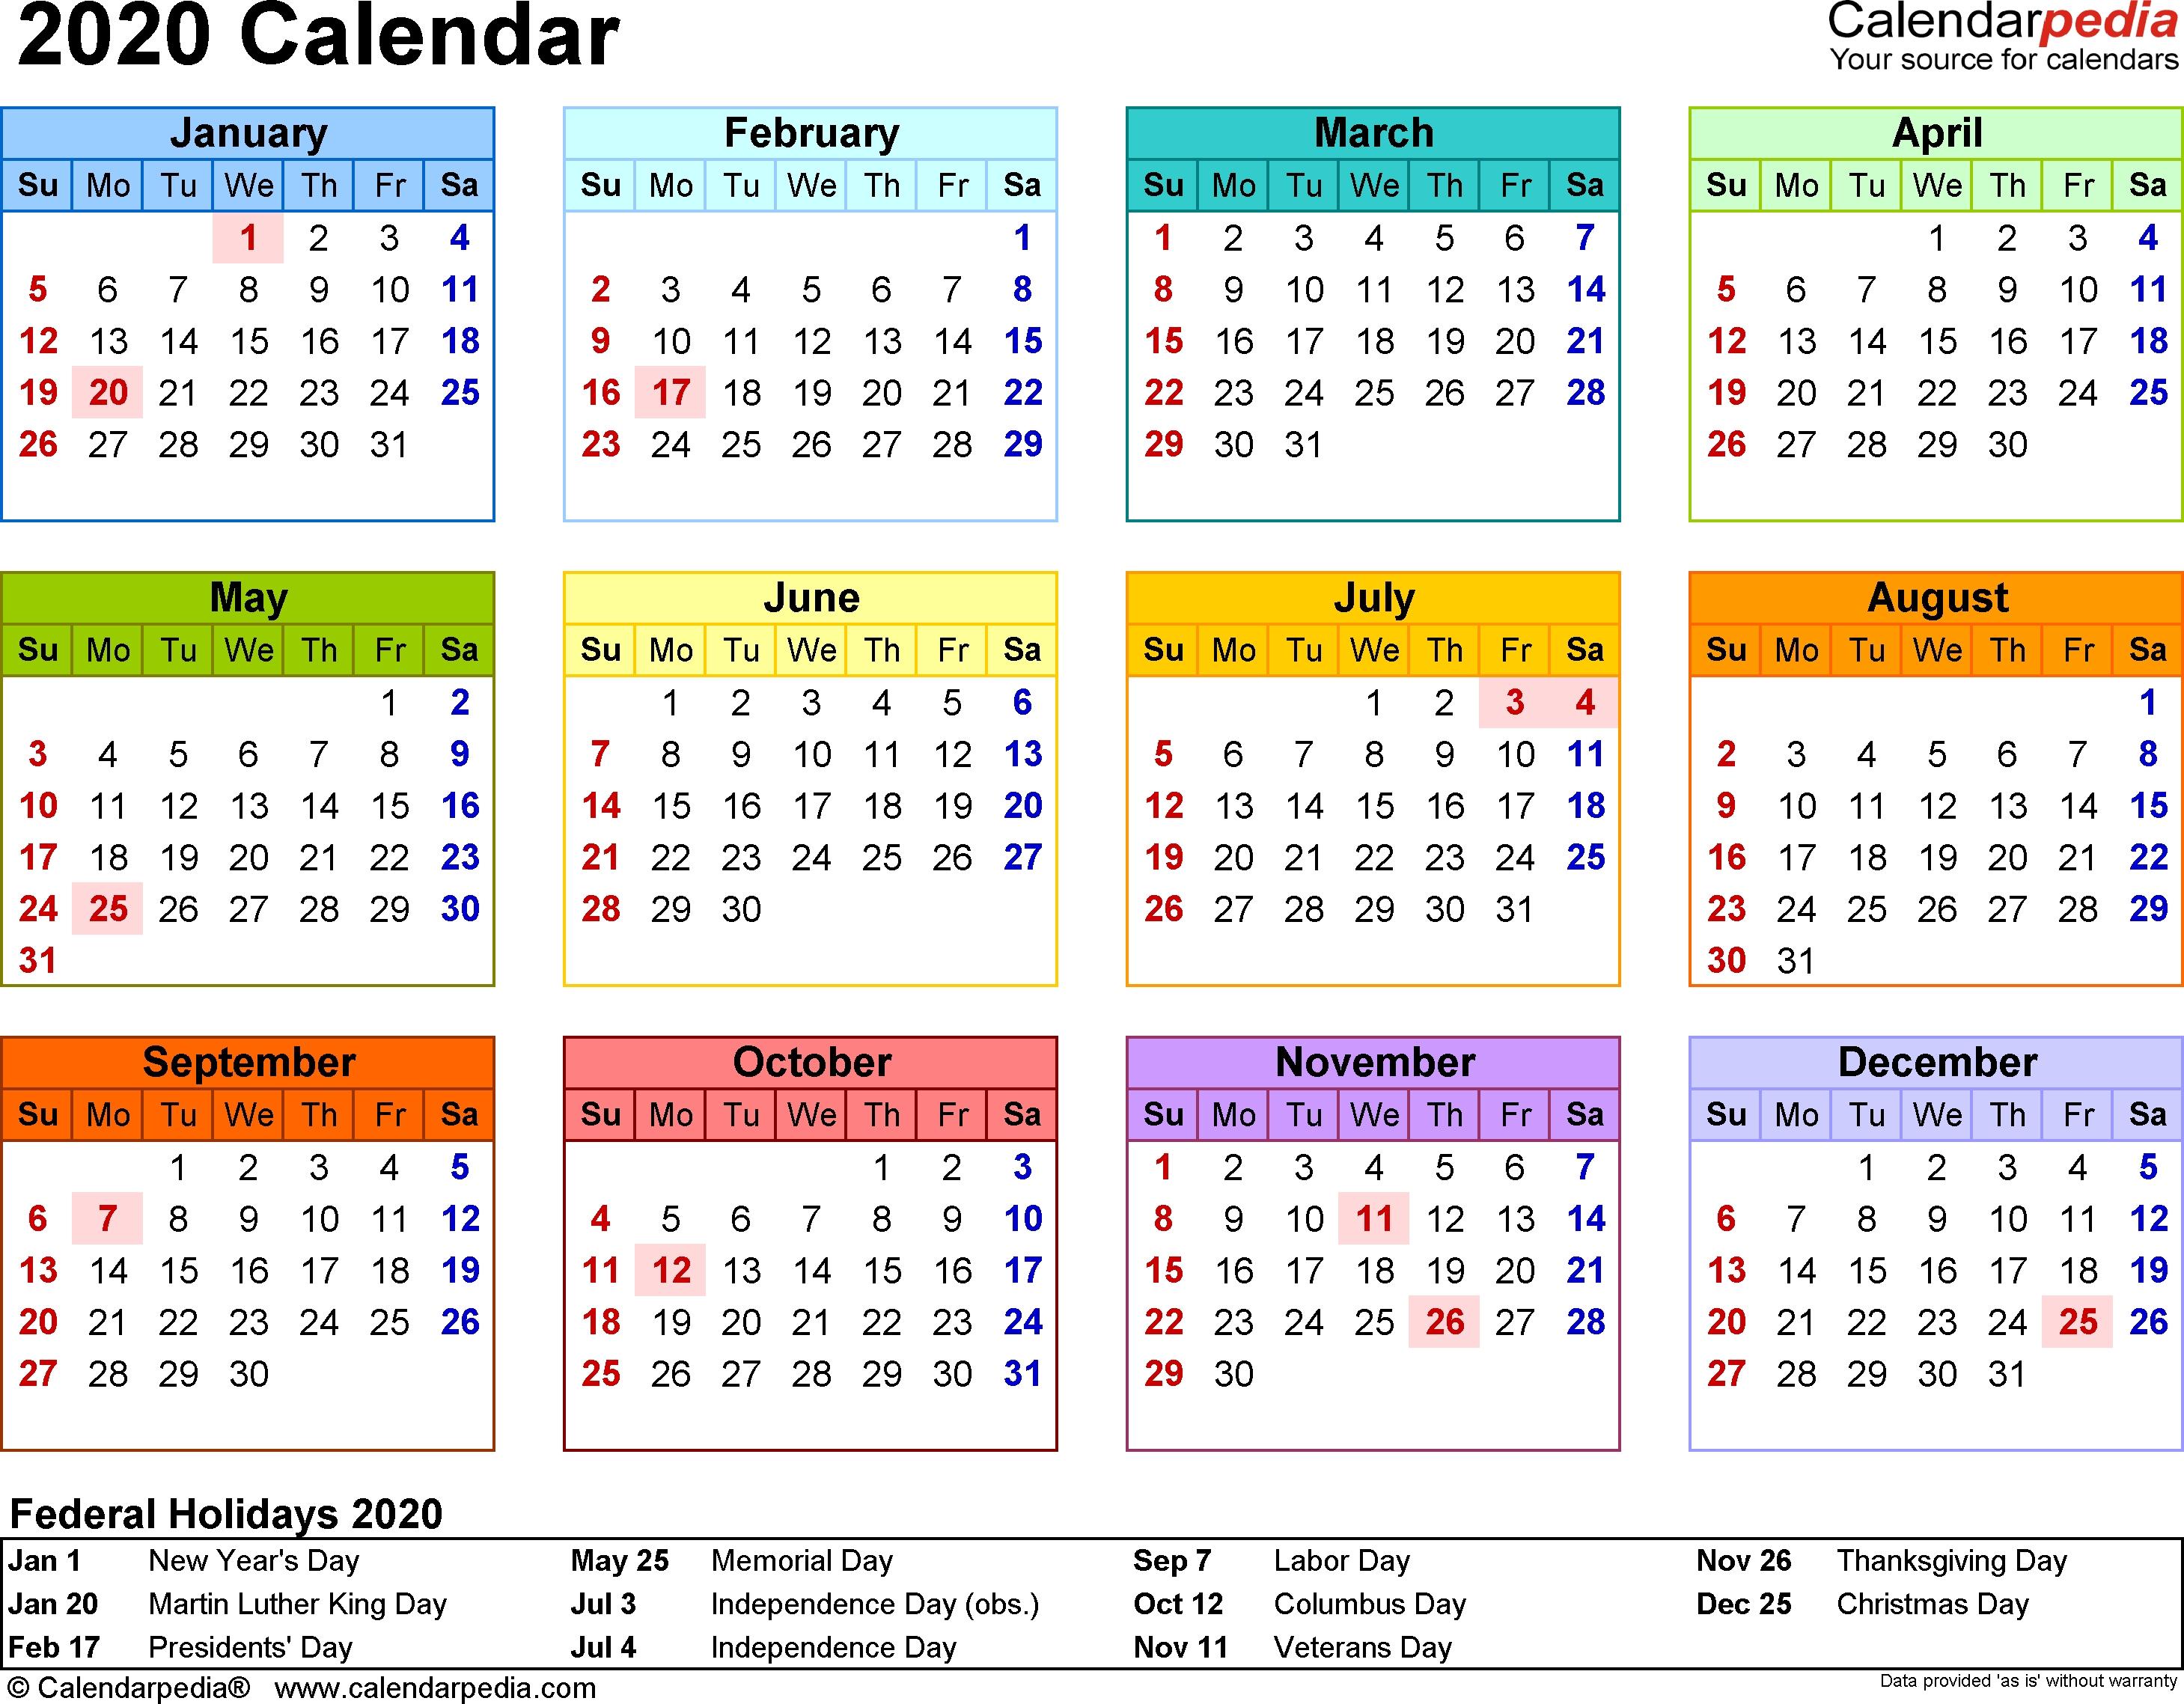 2020 Calendar - 17 Free Printable Word Calendar Templates within Calendar 2020 Year At A Glance Free Printable